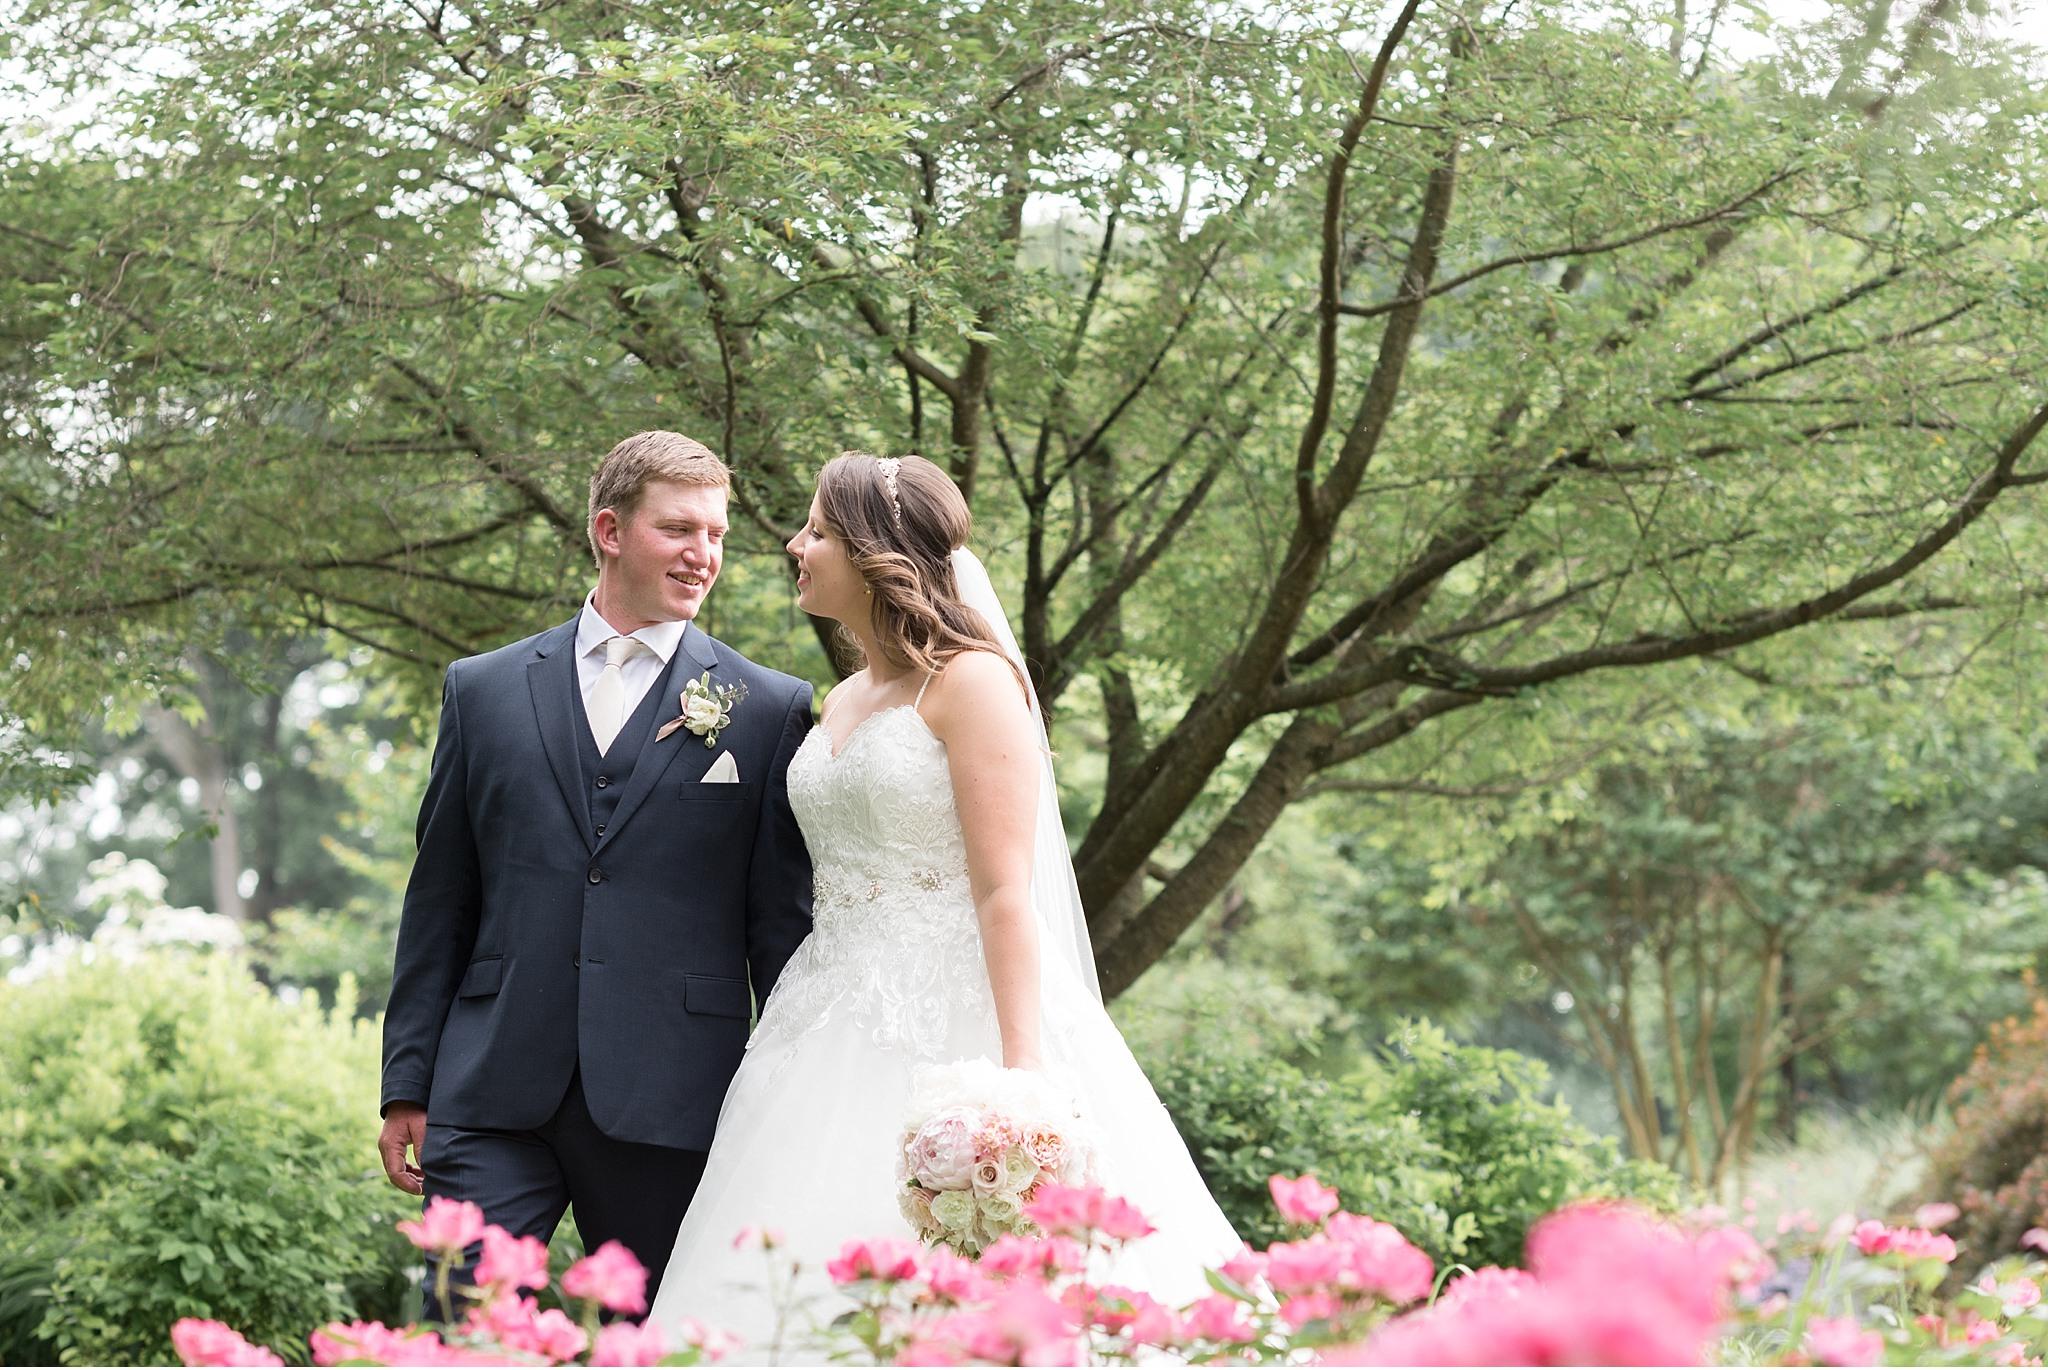 Hershey Gardens Hershey Country Club Summer beautiful wedding photography_1602.jpg